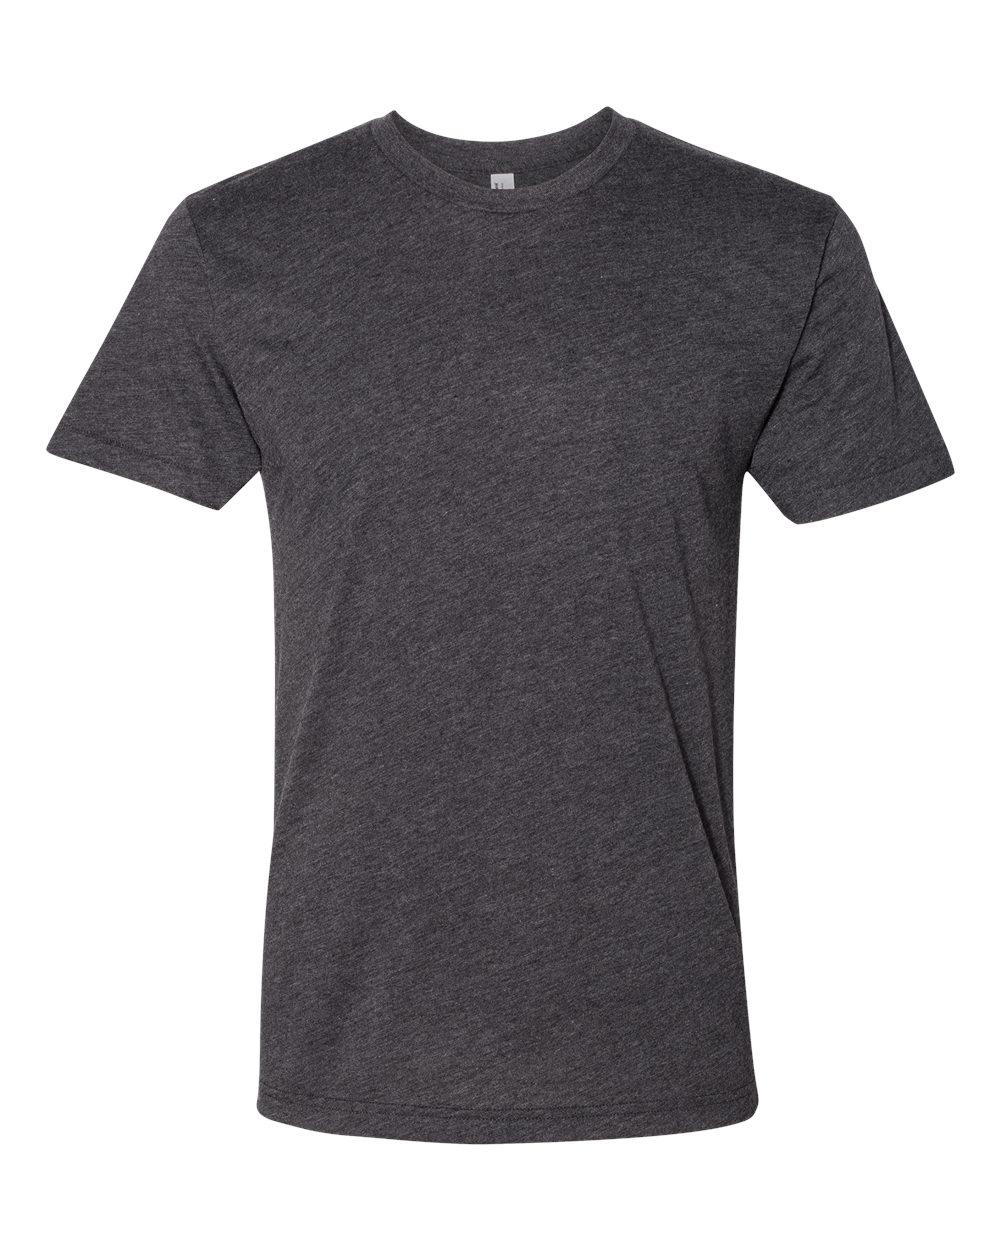 American-Apparel-Mens-Slim-Fit-50-50-Cotton-T-Shirt-Tee-BB401W-up-to-2XL thumbnail 15